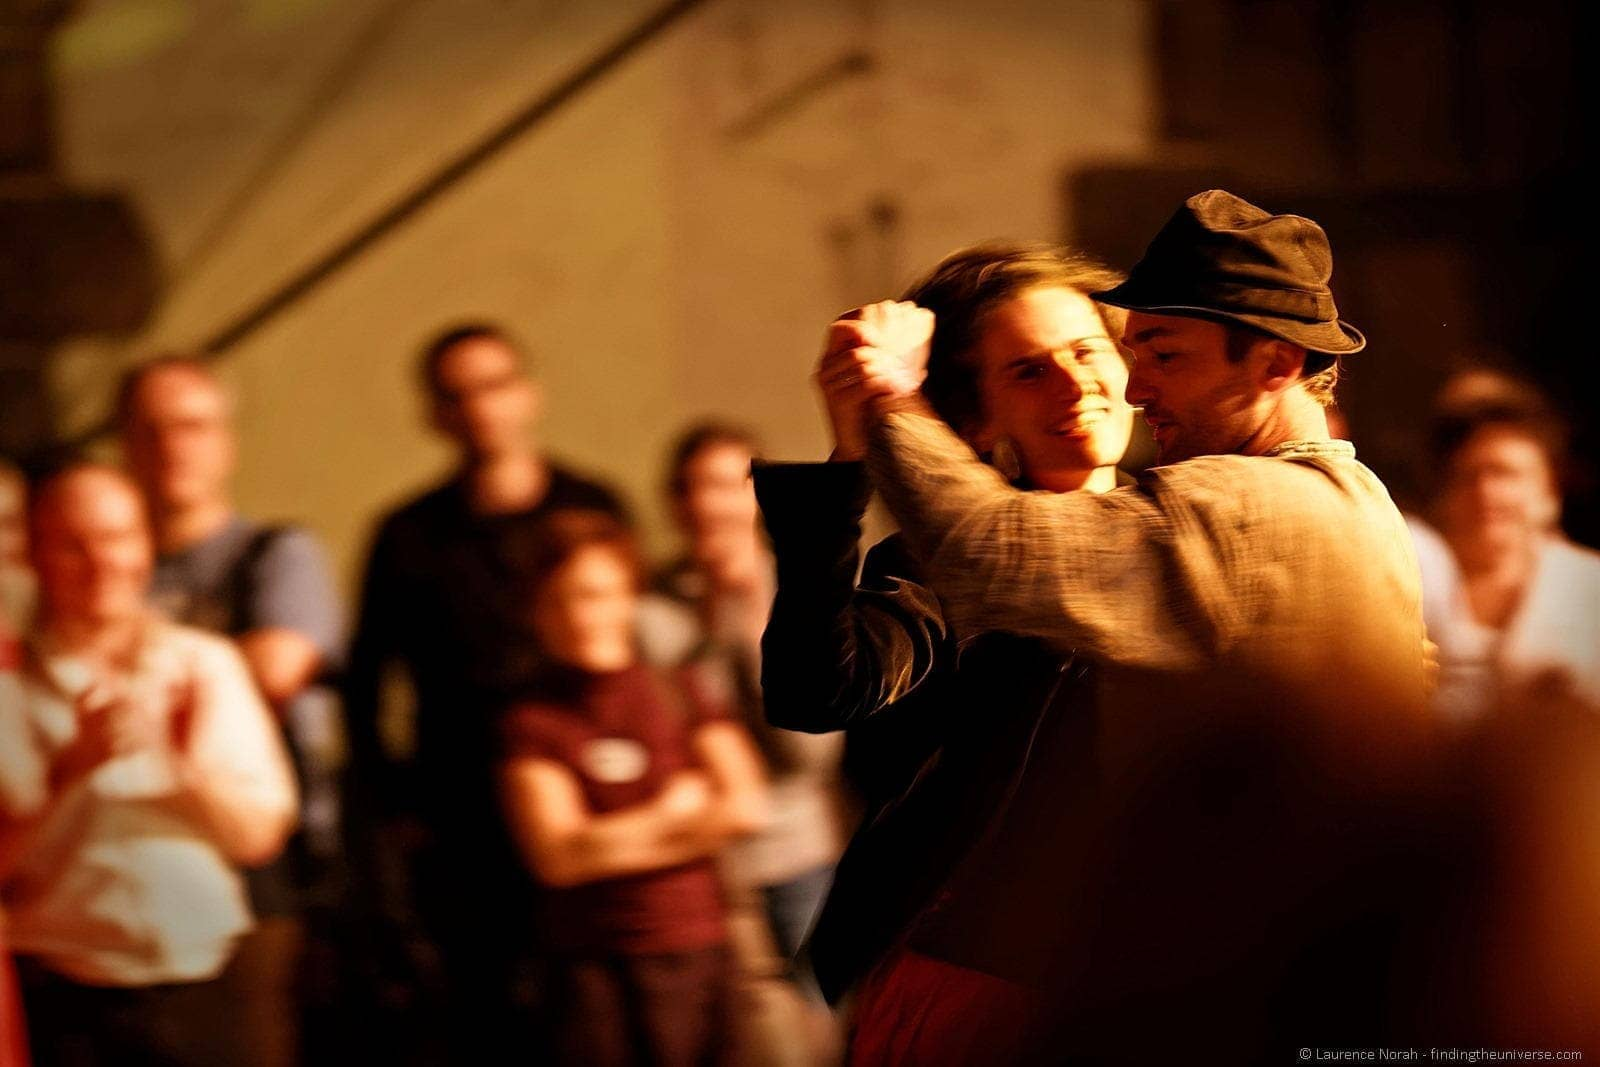 Ethno port festival dancing poznan poland